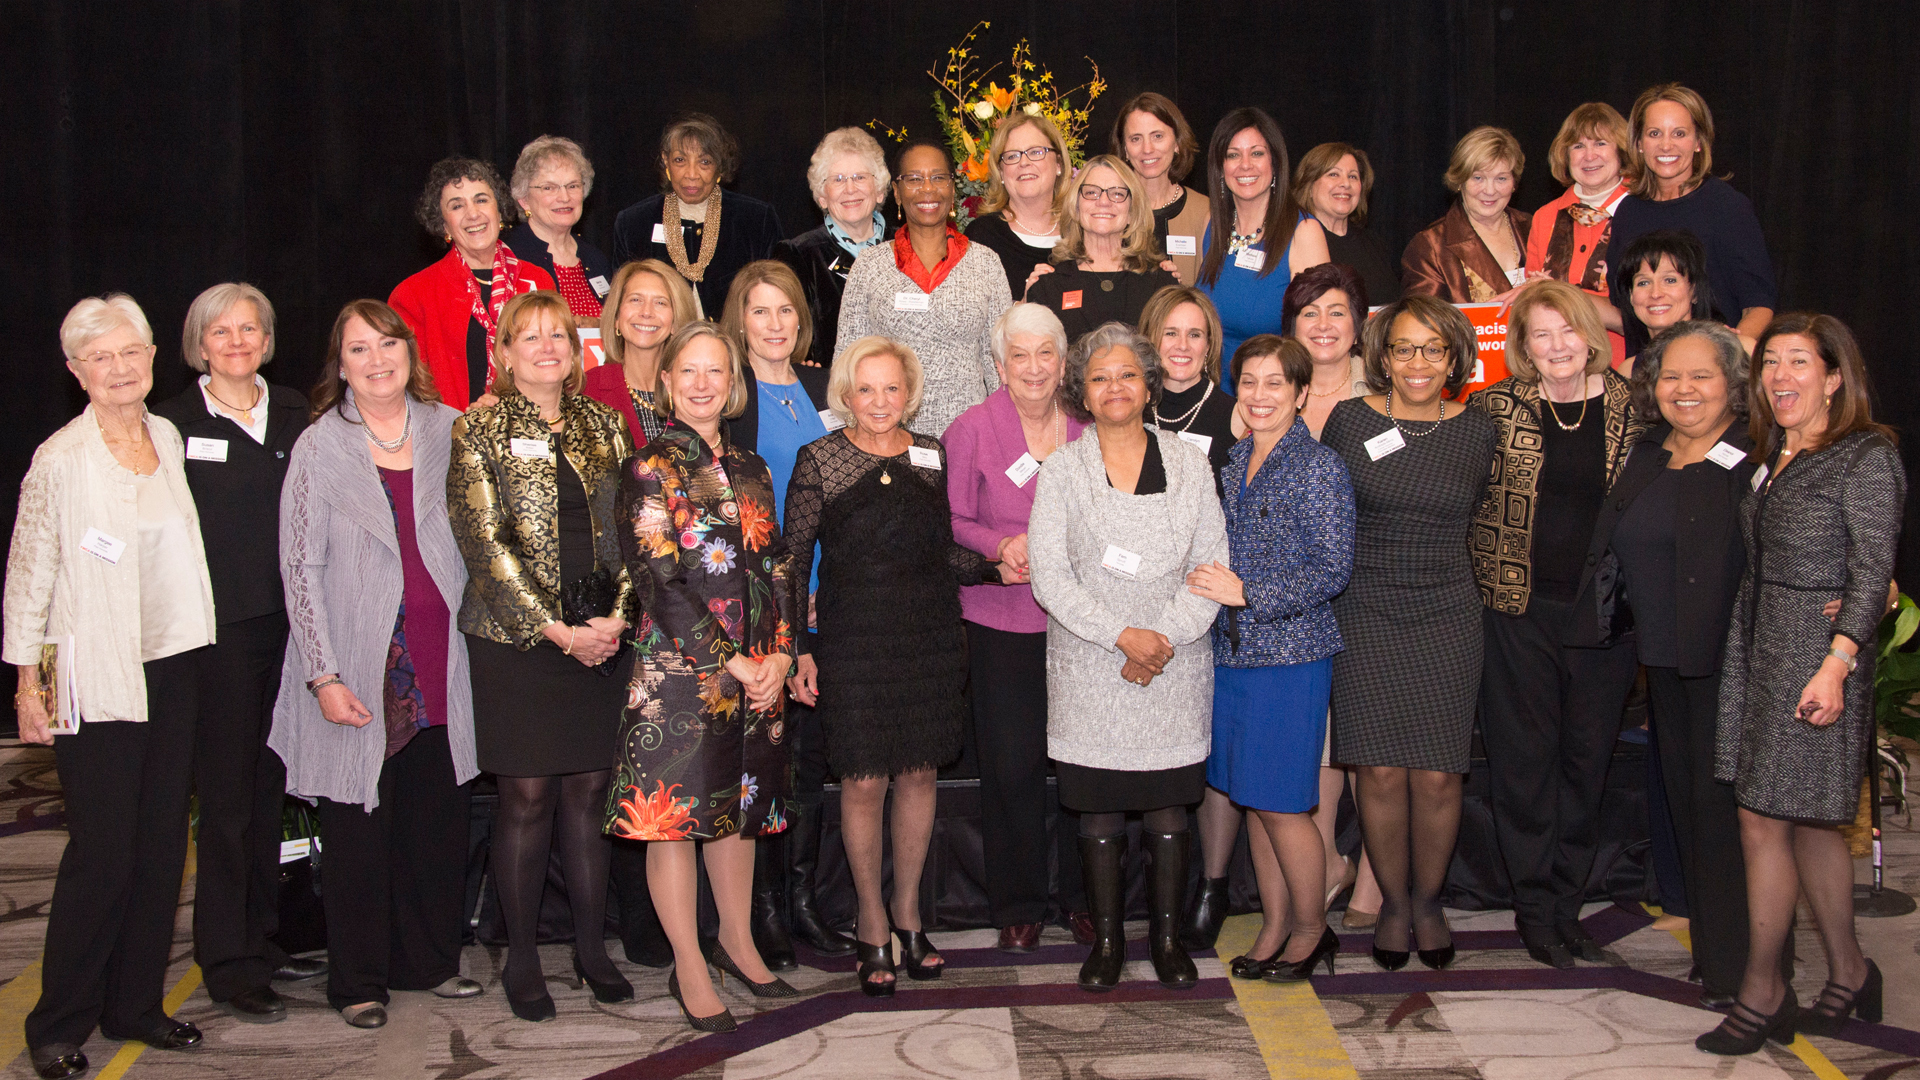 2019 Tribute Honorees | YWCA Princeton